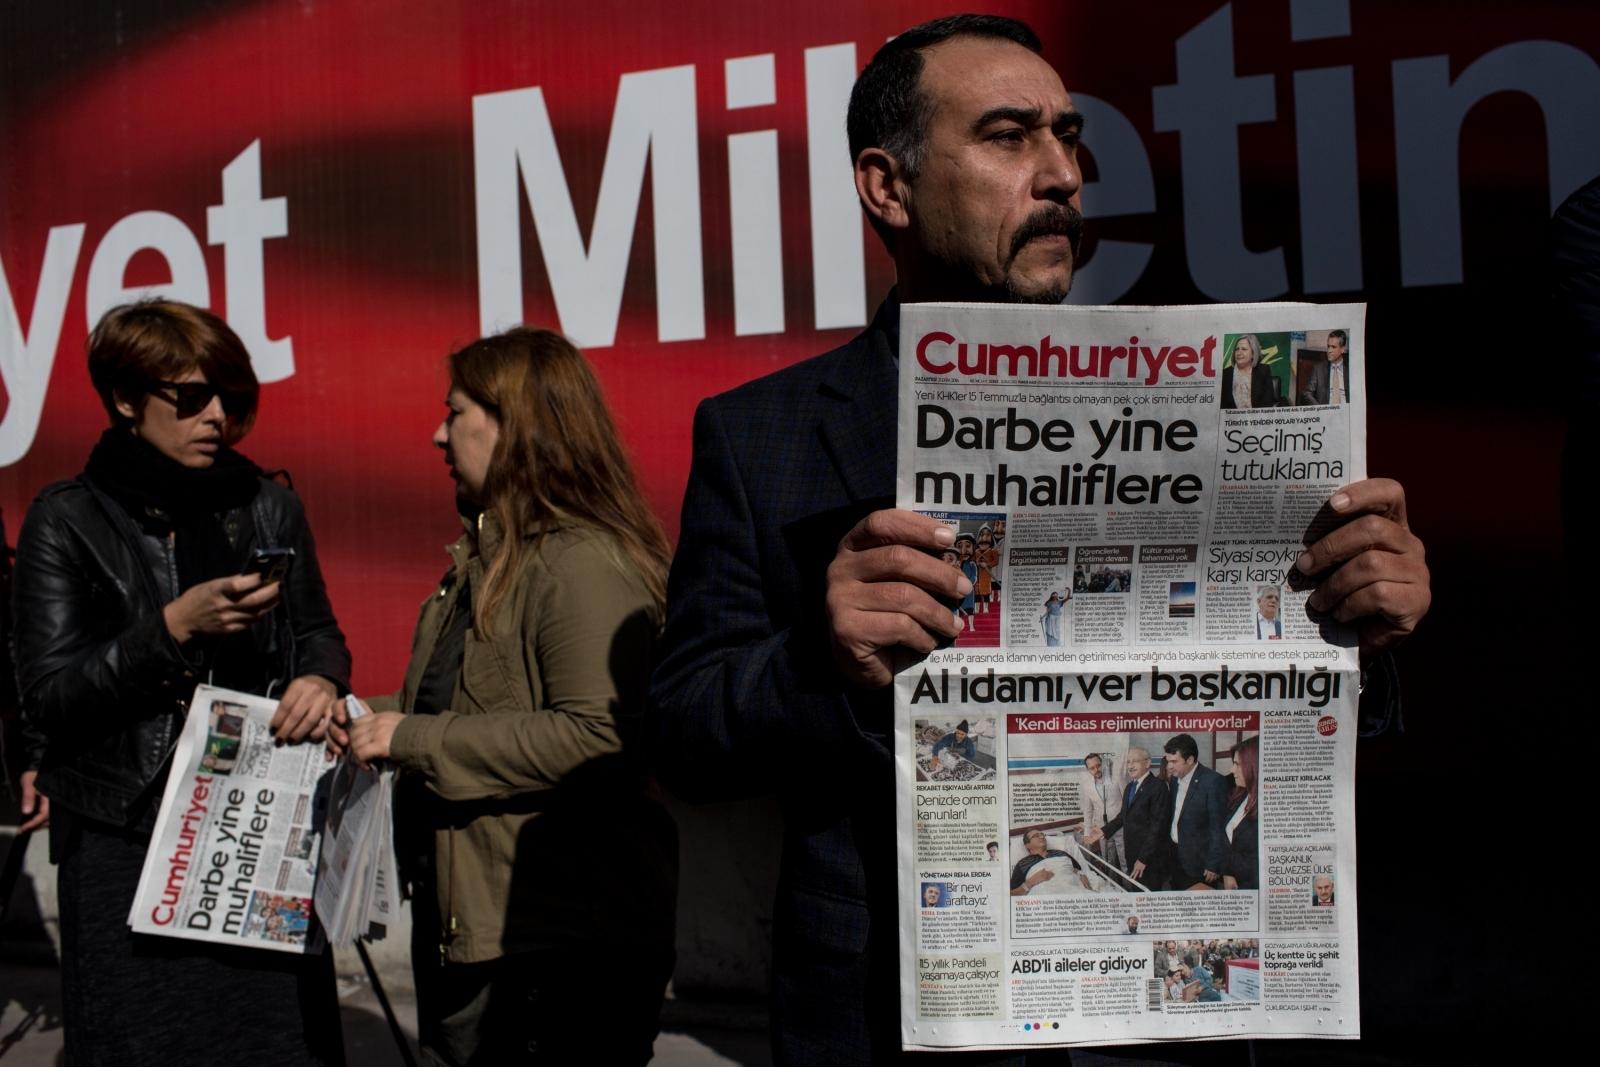 Cumhuriyet Turkey